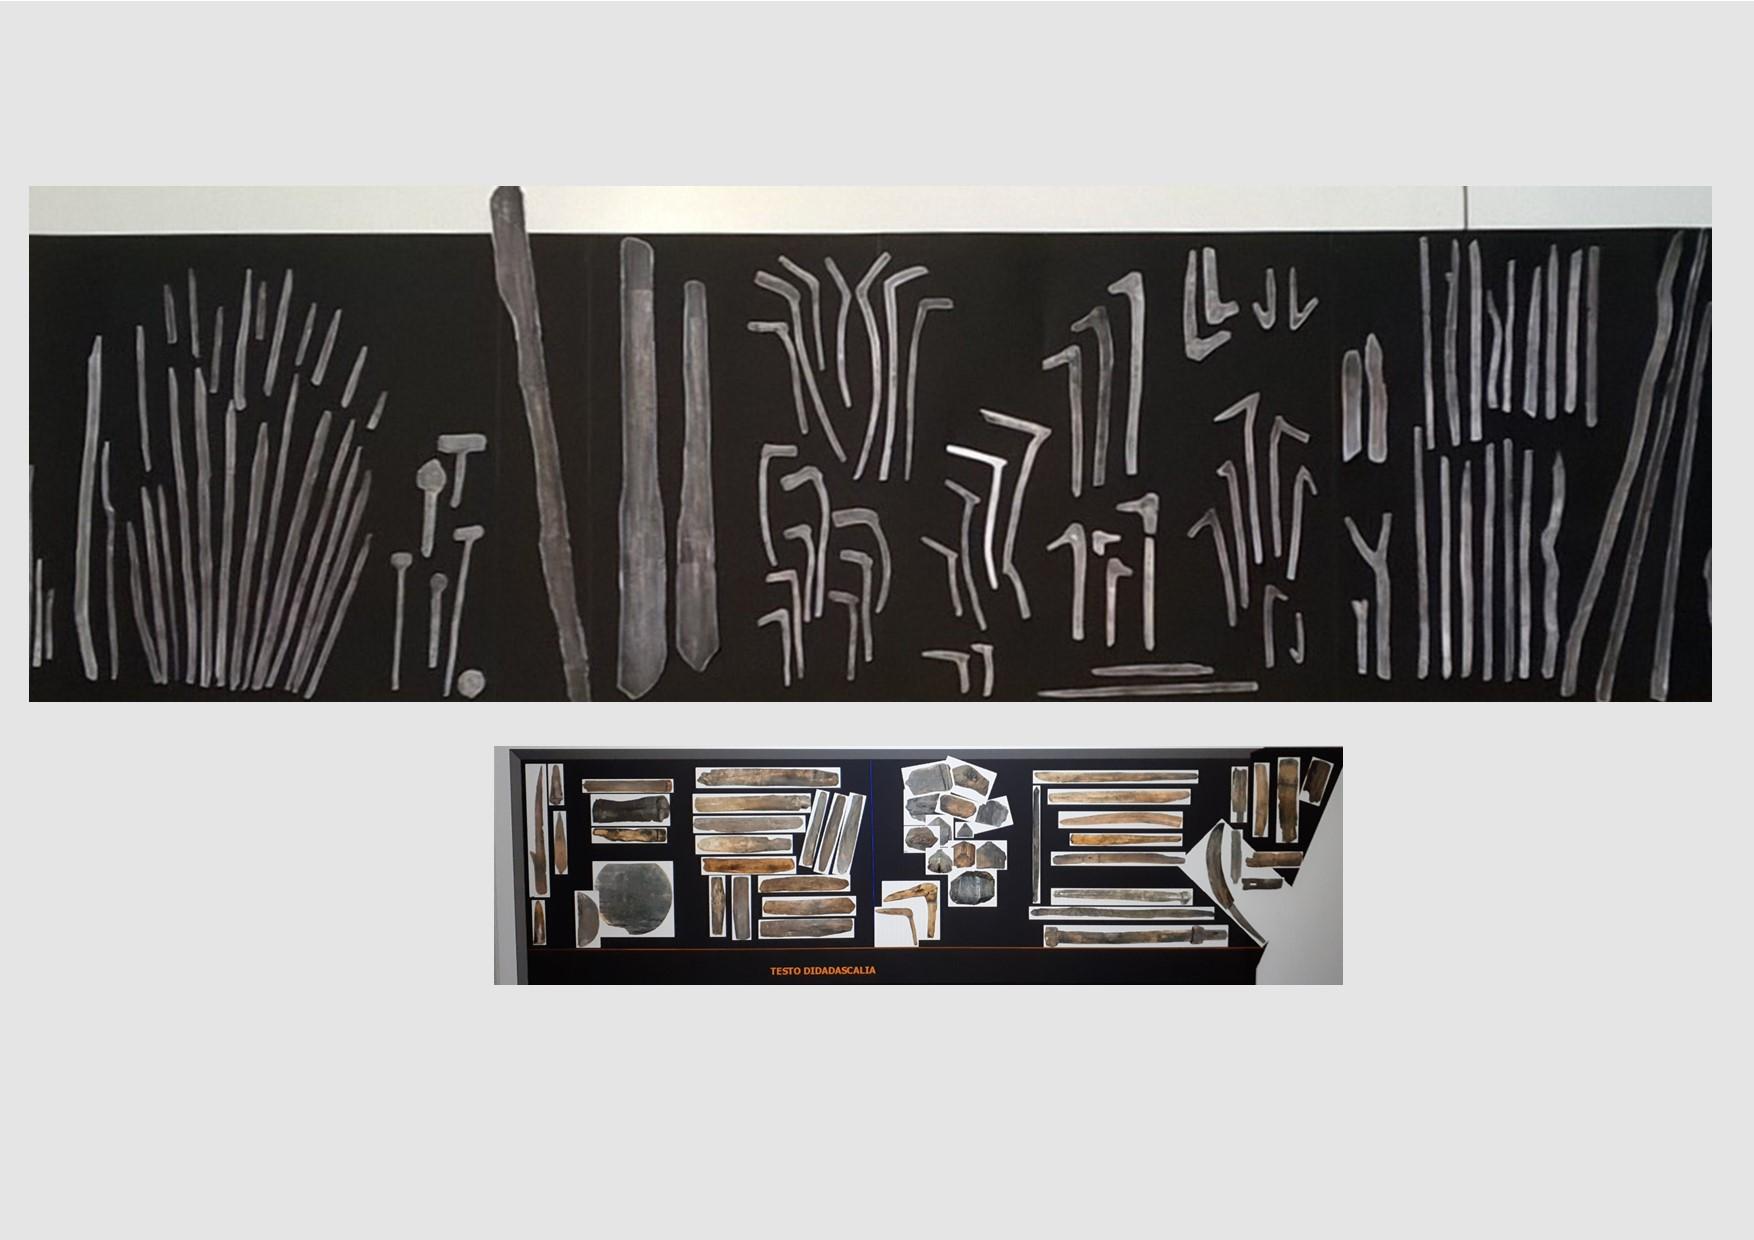 noceto_museo-archeologico-vasca-votiva_allestimento-vetrine_2_foto-mic-ERO